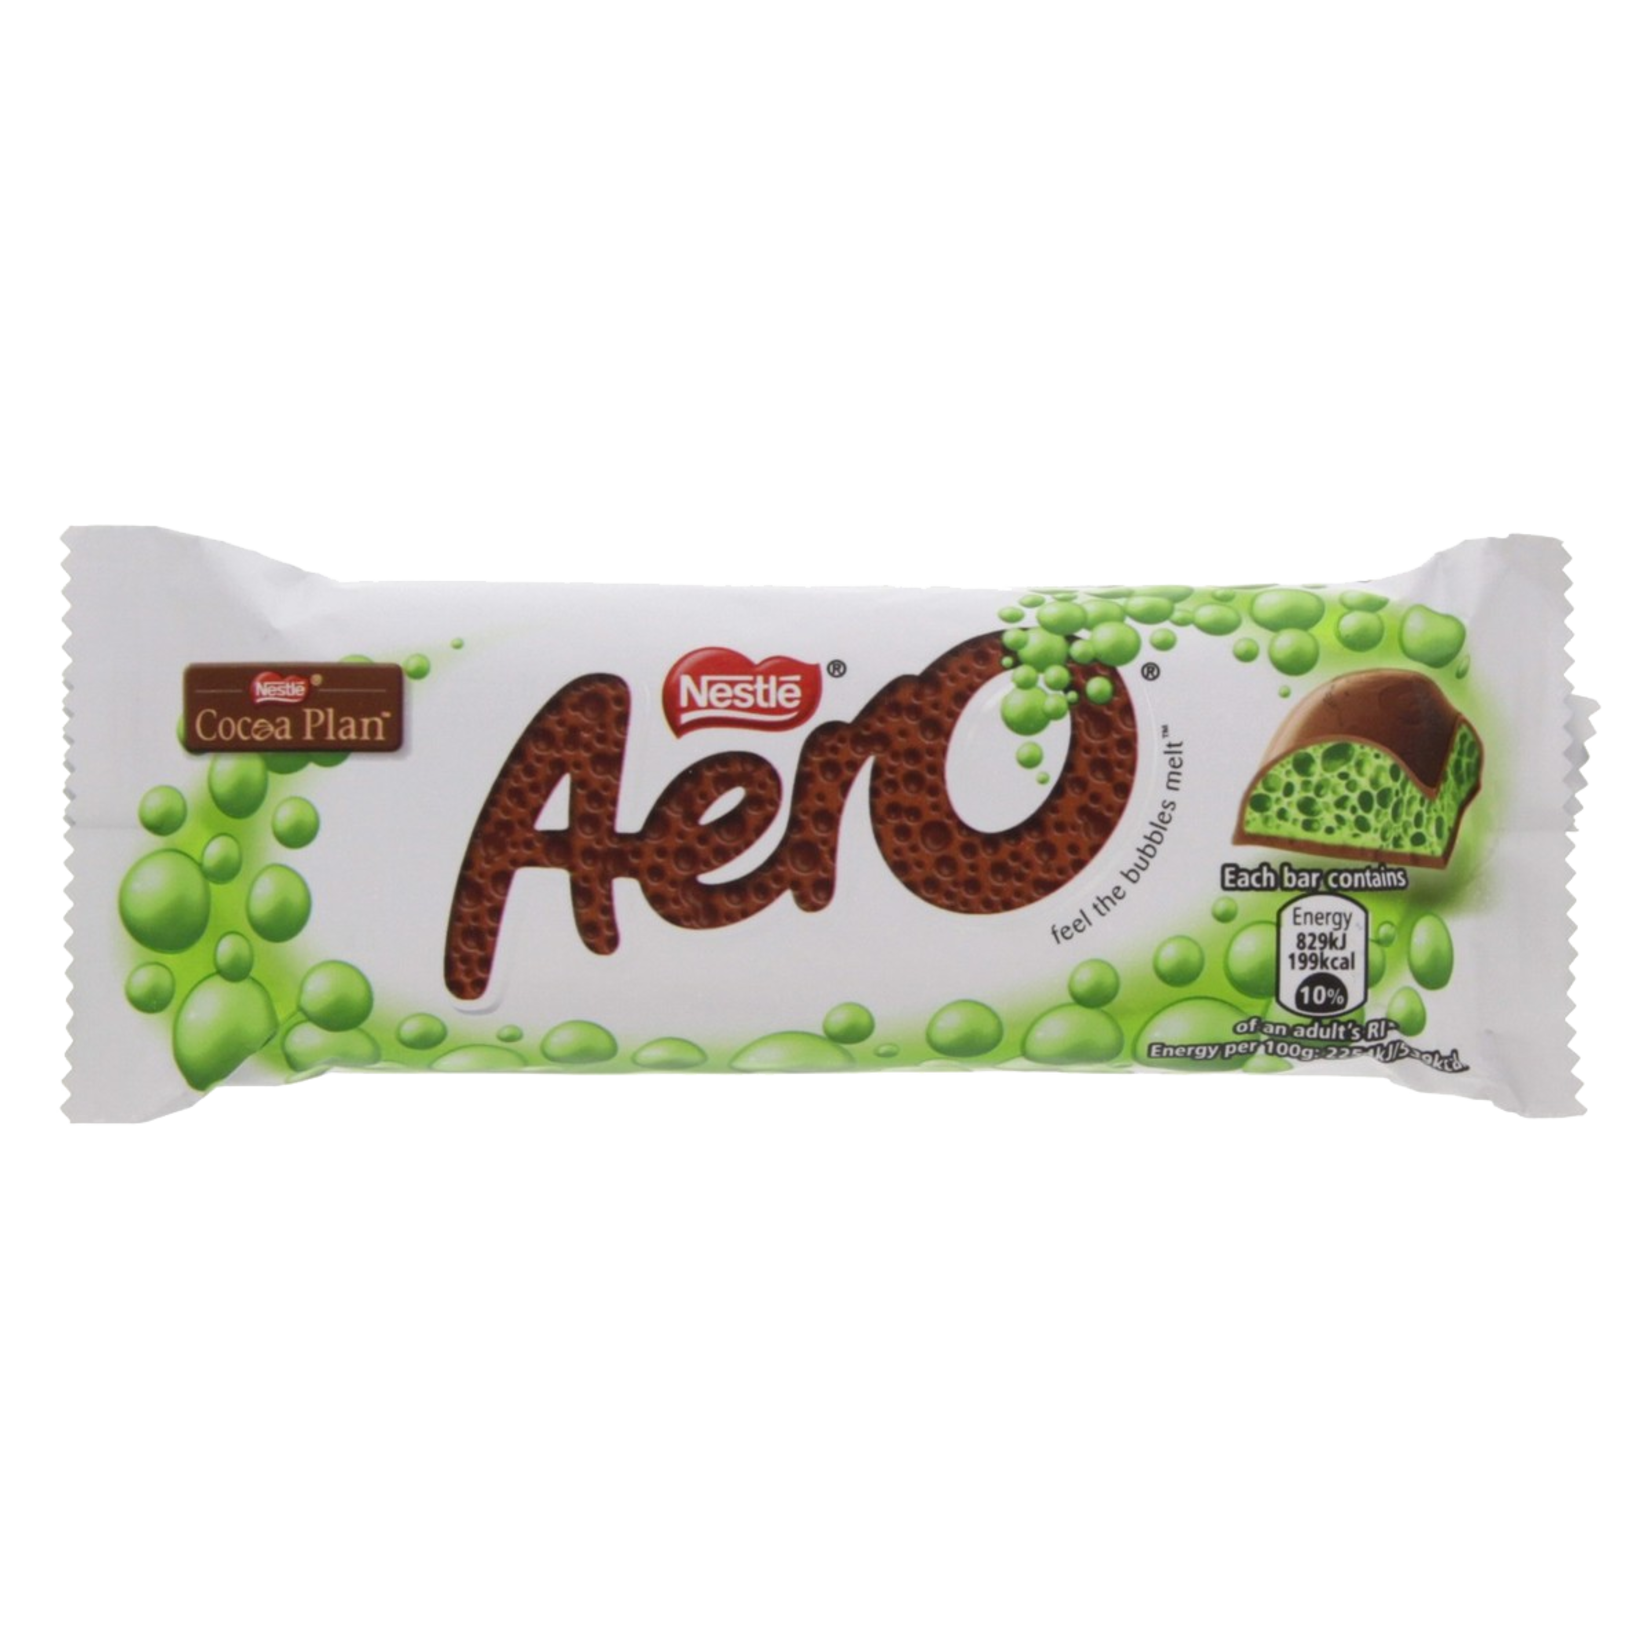 Aero Peppermint, 36g